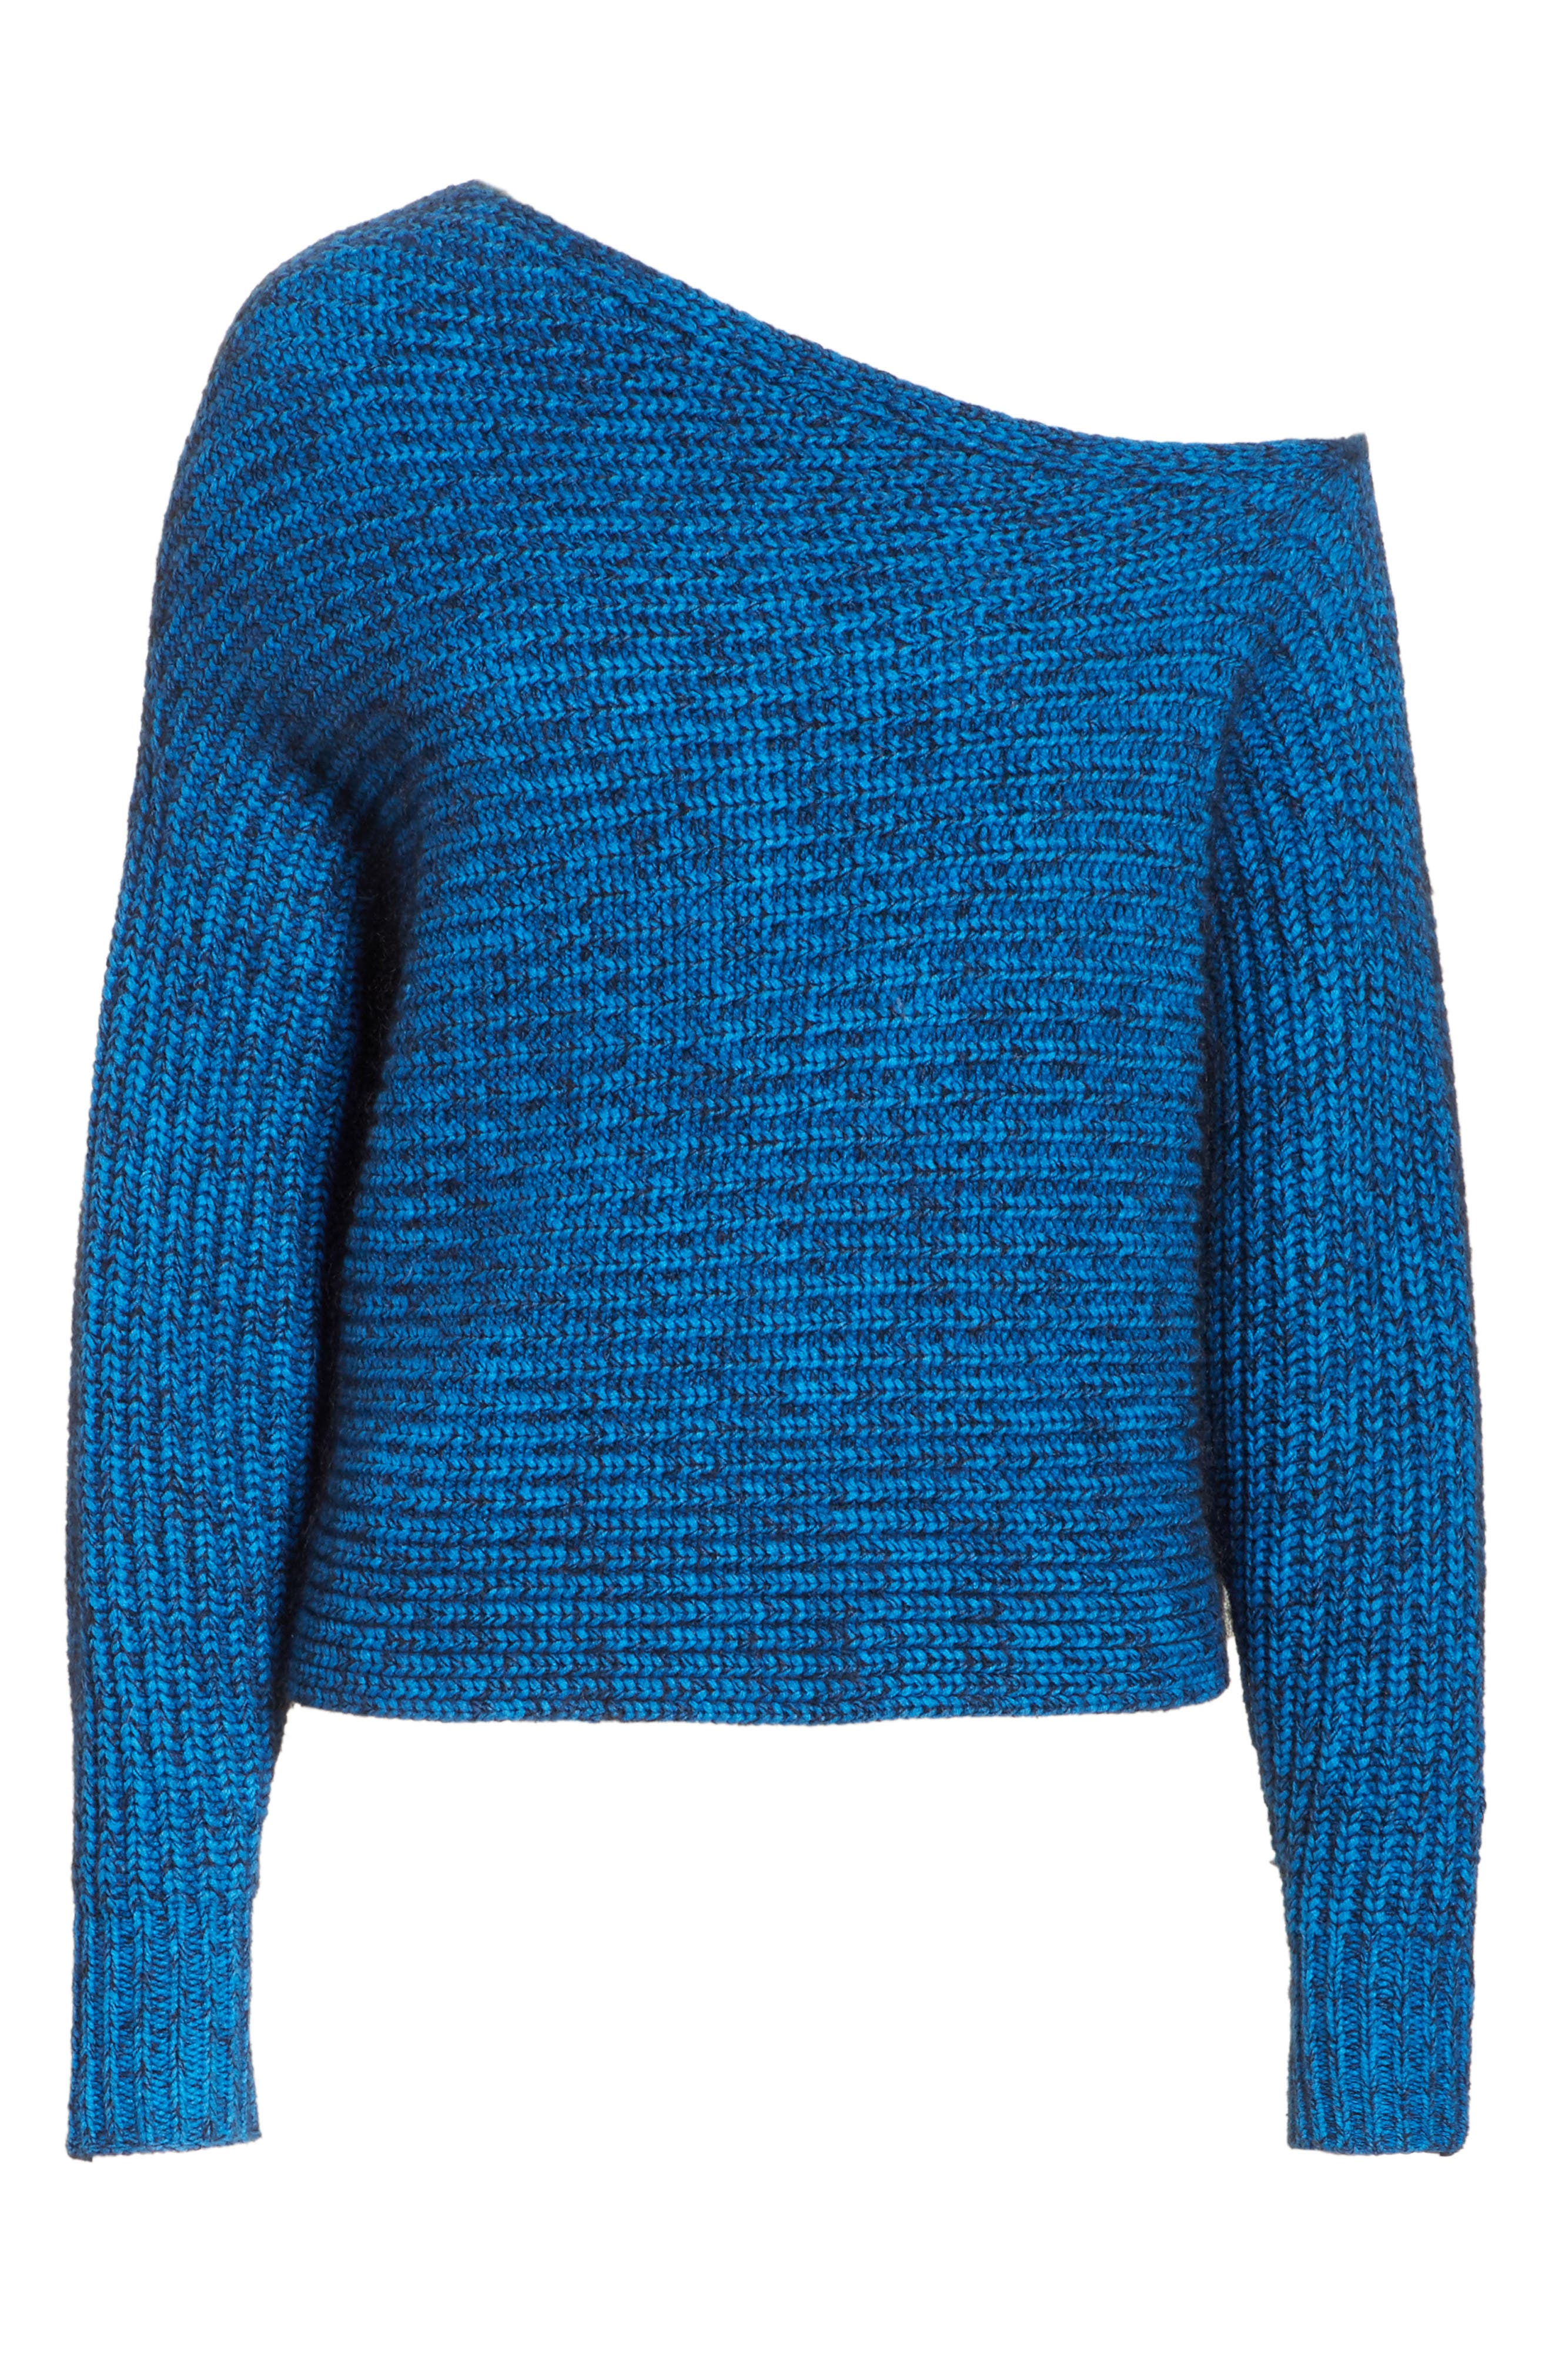 Asymmetrical Knit Sweater,                             Alternate thumbnail 6, color,                             437